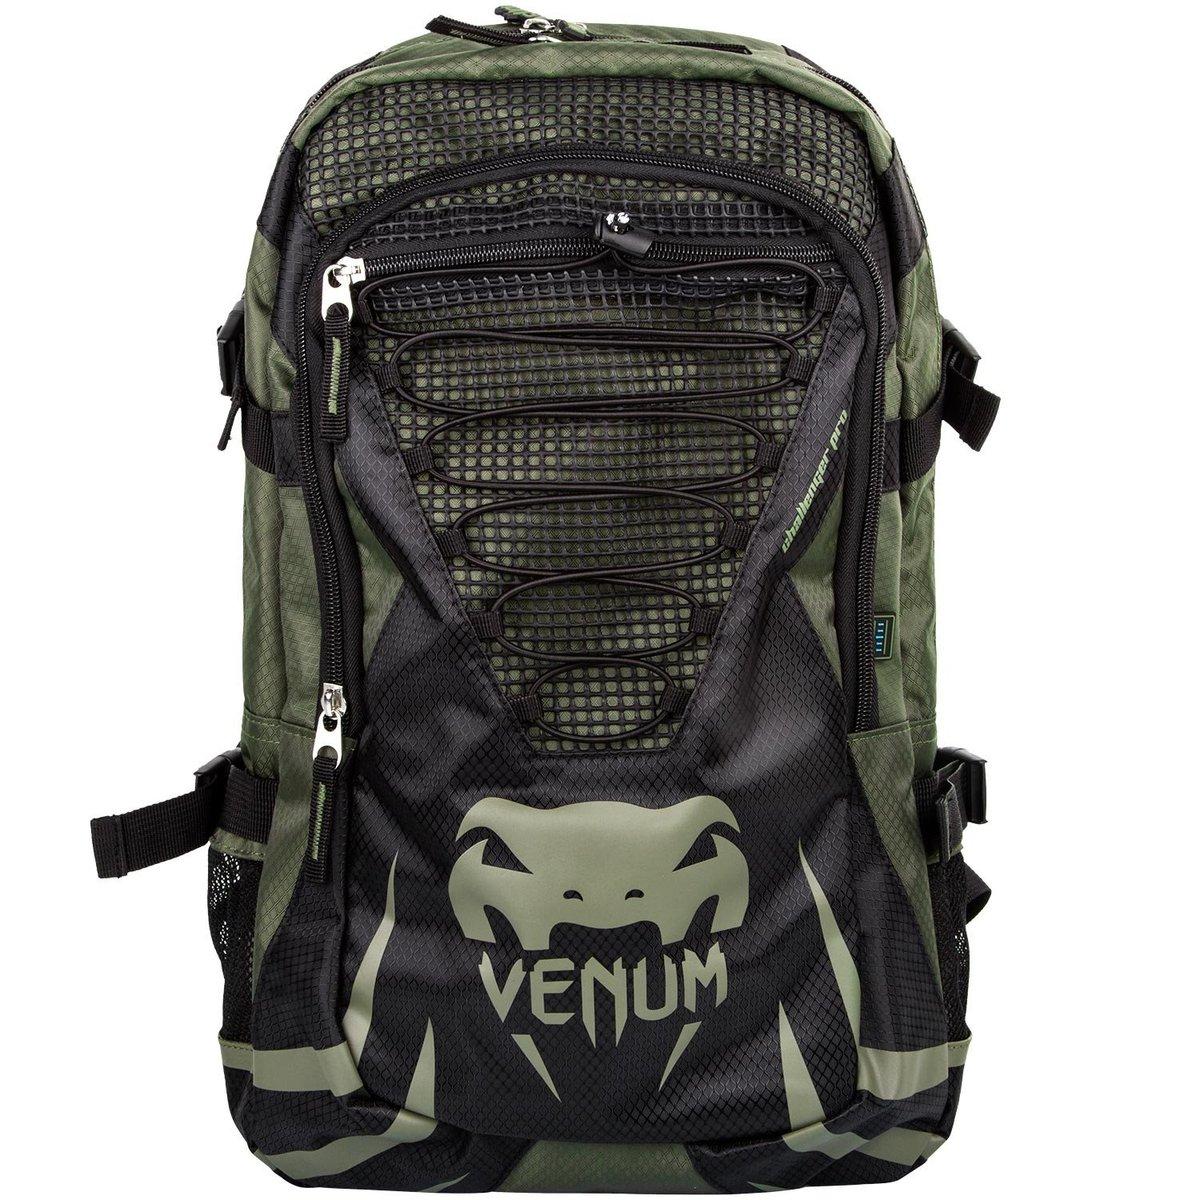 batoh VENUM - Challenger Pro - Khaki / Black - VENUM-2122-200